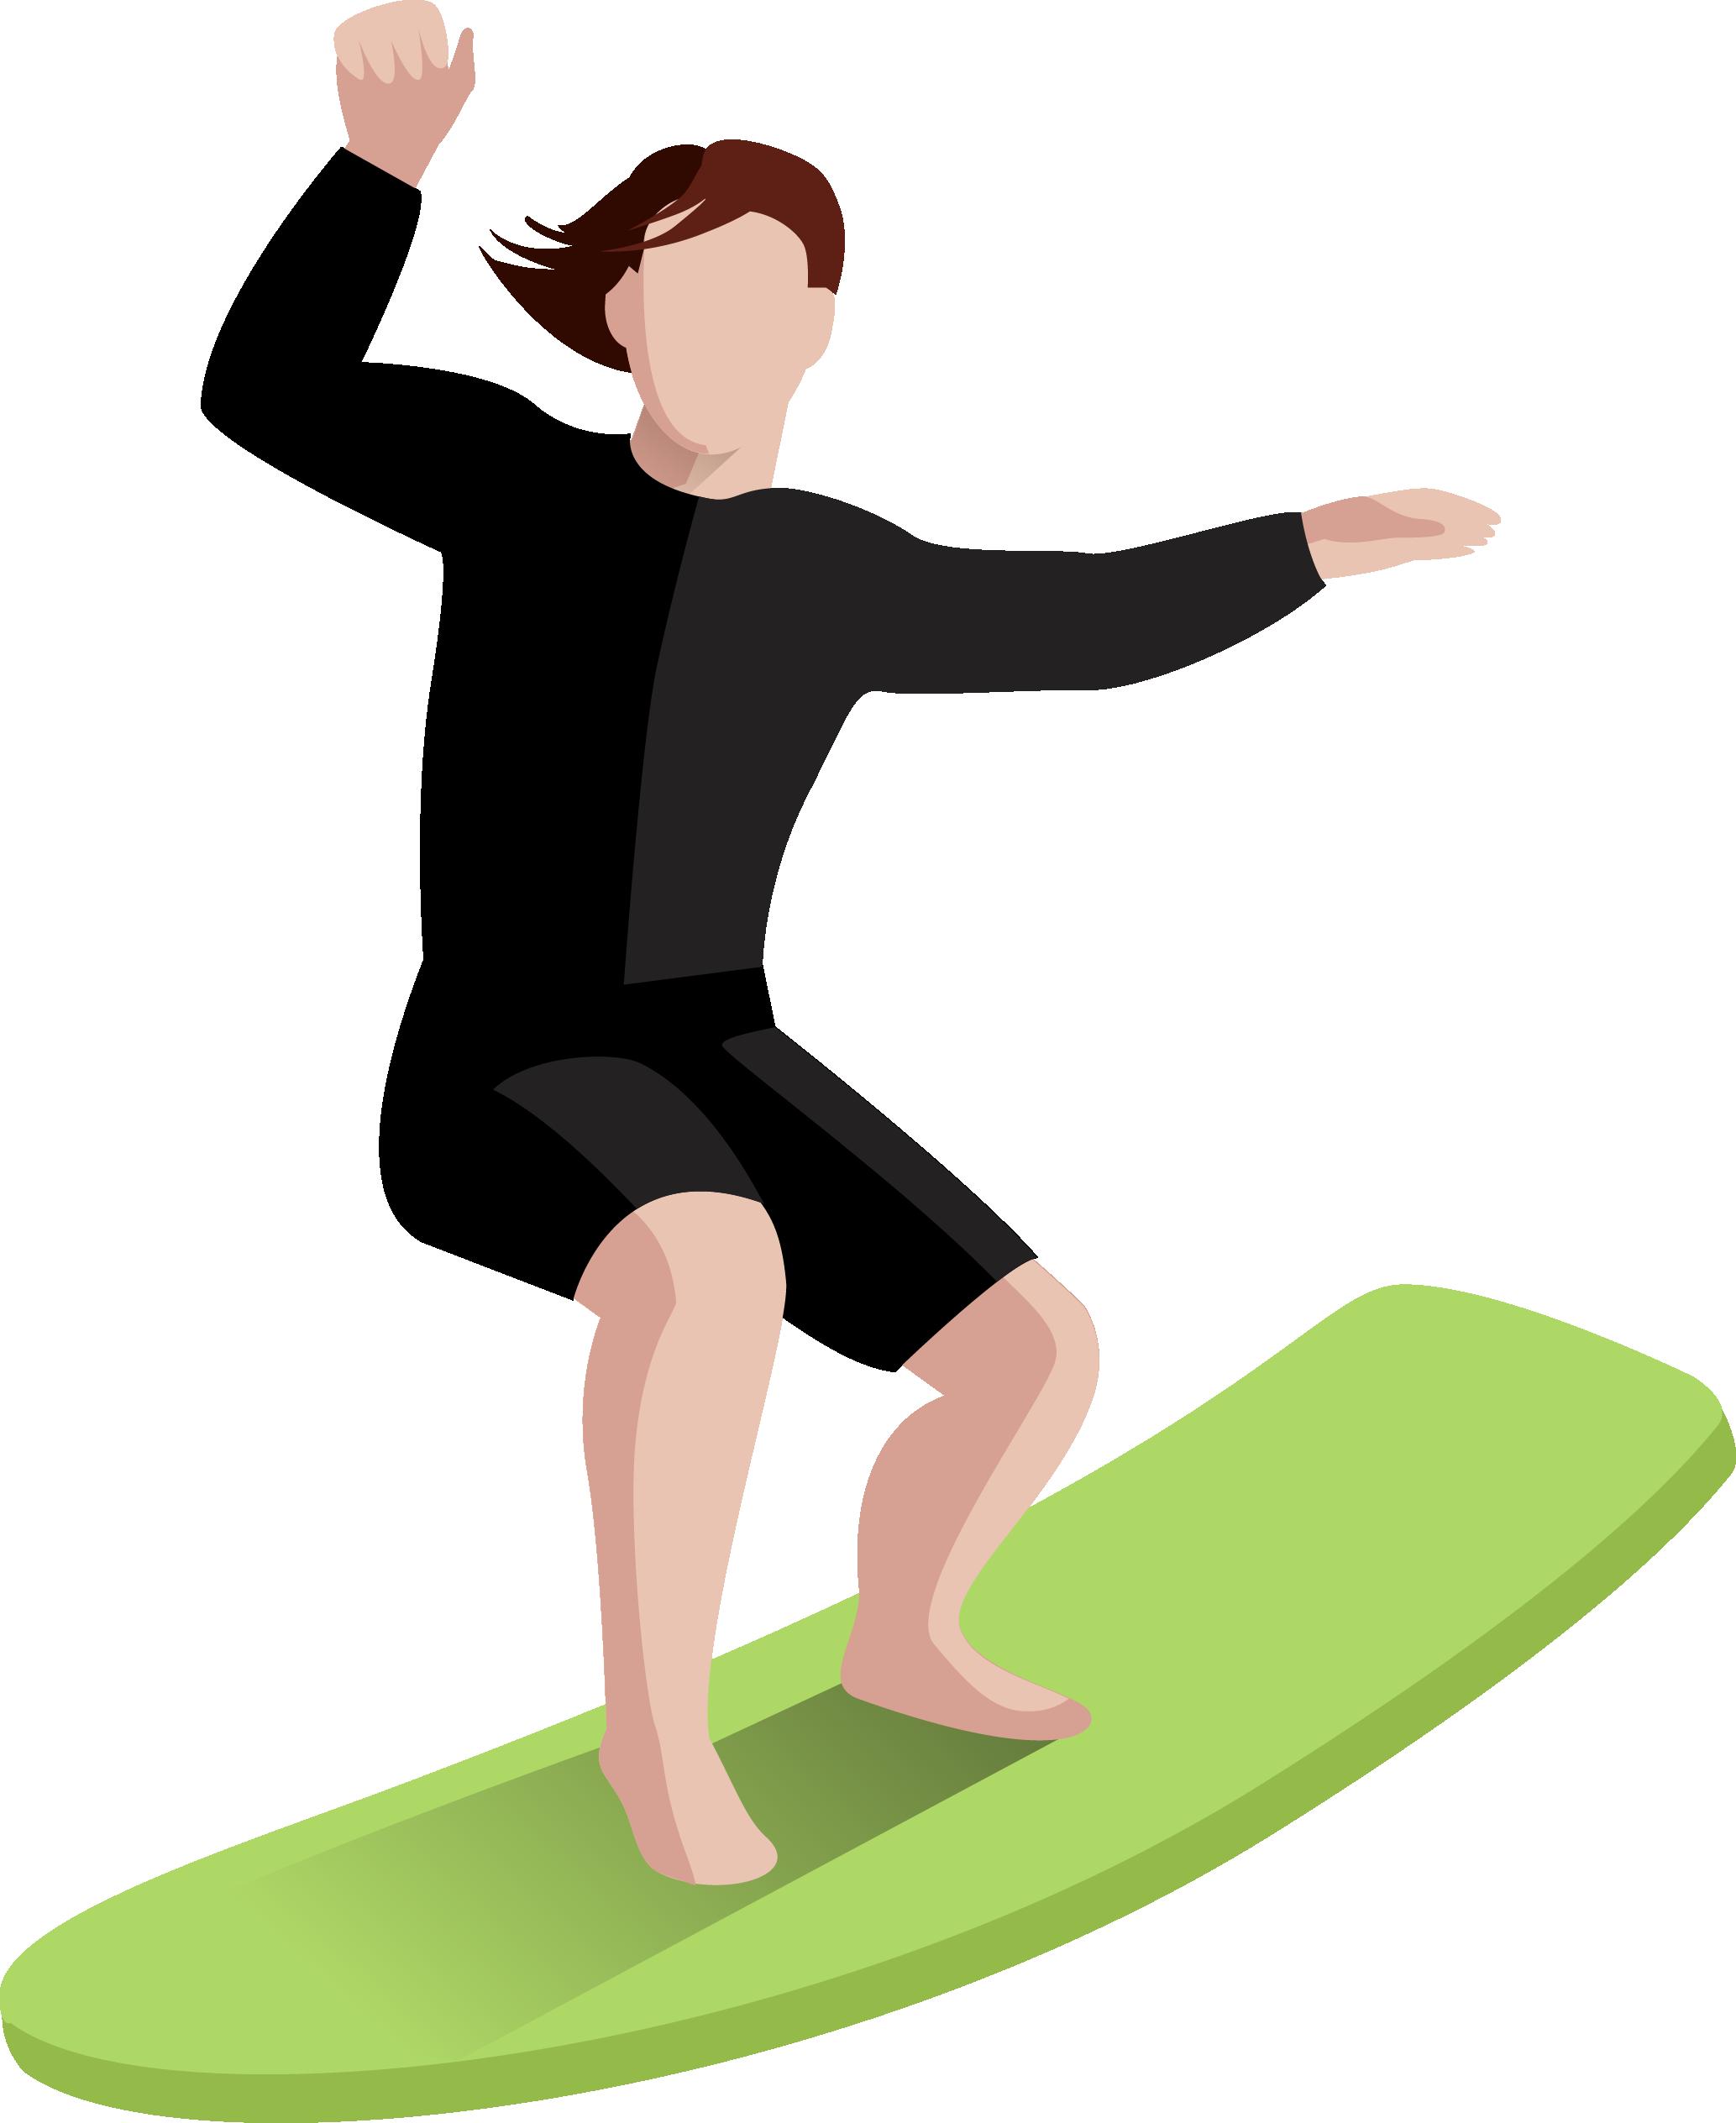 Skiing clipart water ski, Skiing water ski Transparent FREE.